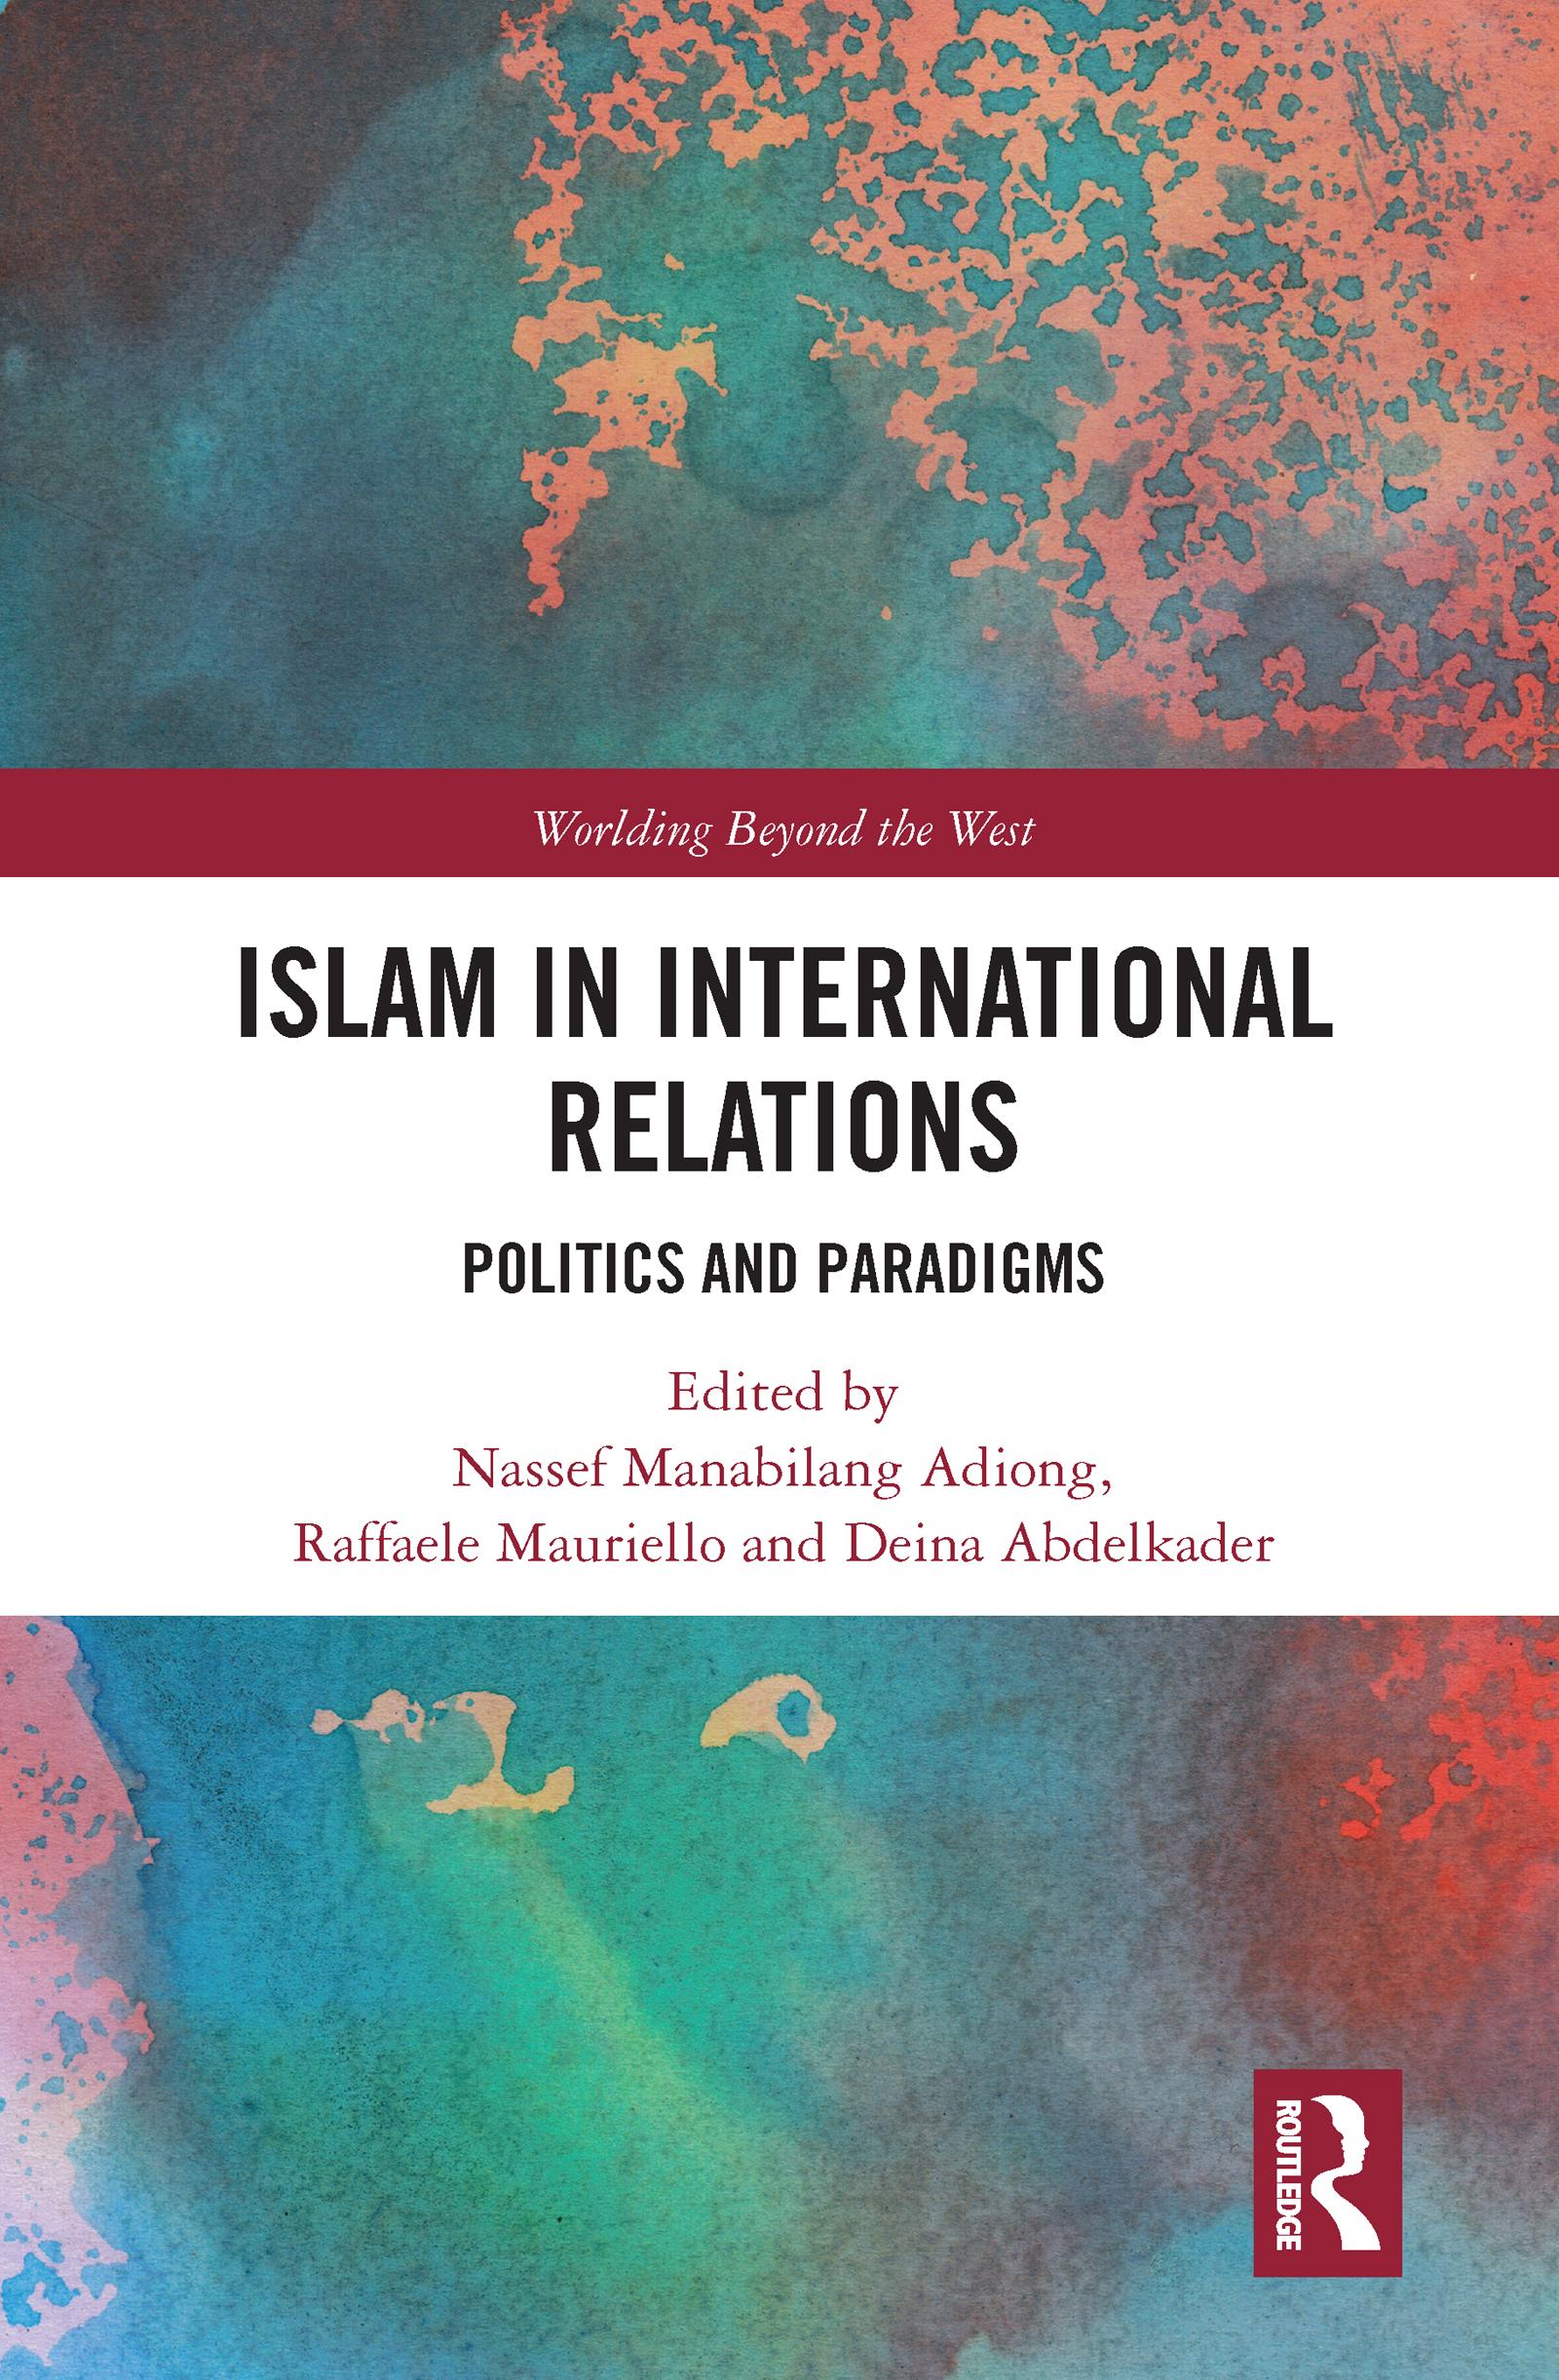 Islam in International Relations